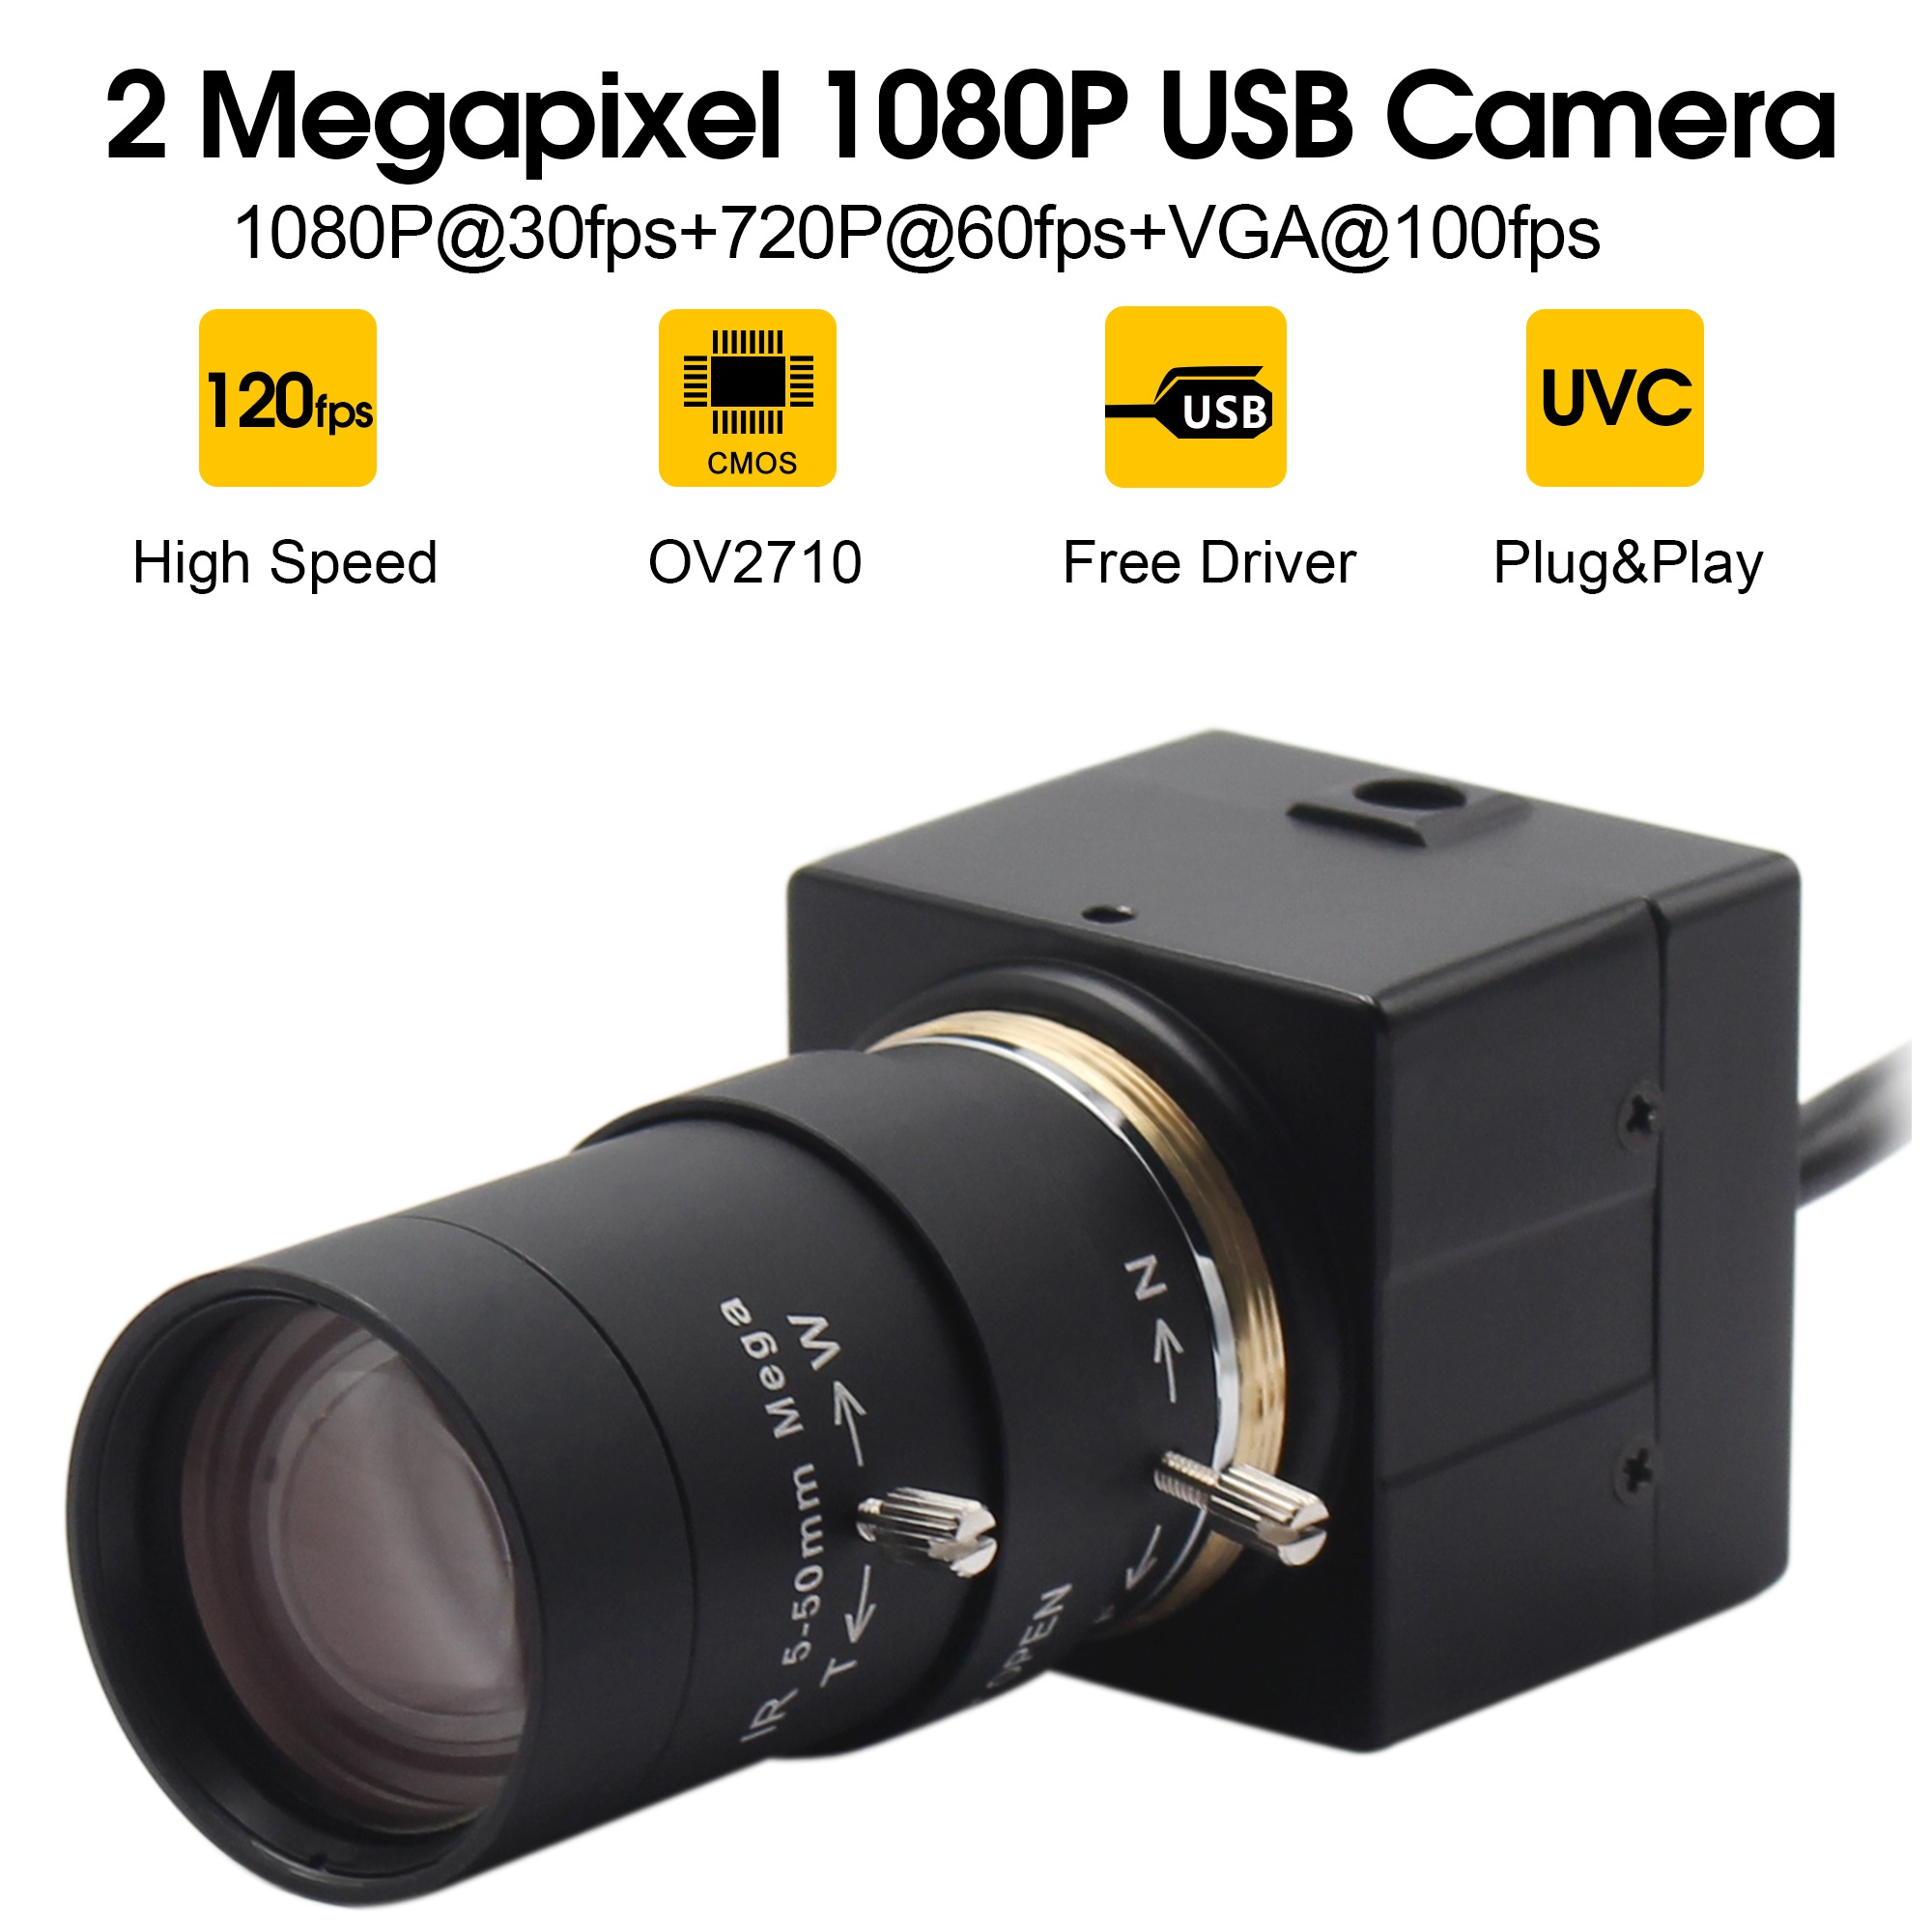 1080P USB Webcam 5 50mm CS Mount Varifocus lens CMOS OV2710 MJPEG 30fps 60fps 120fps USB